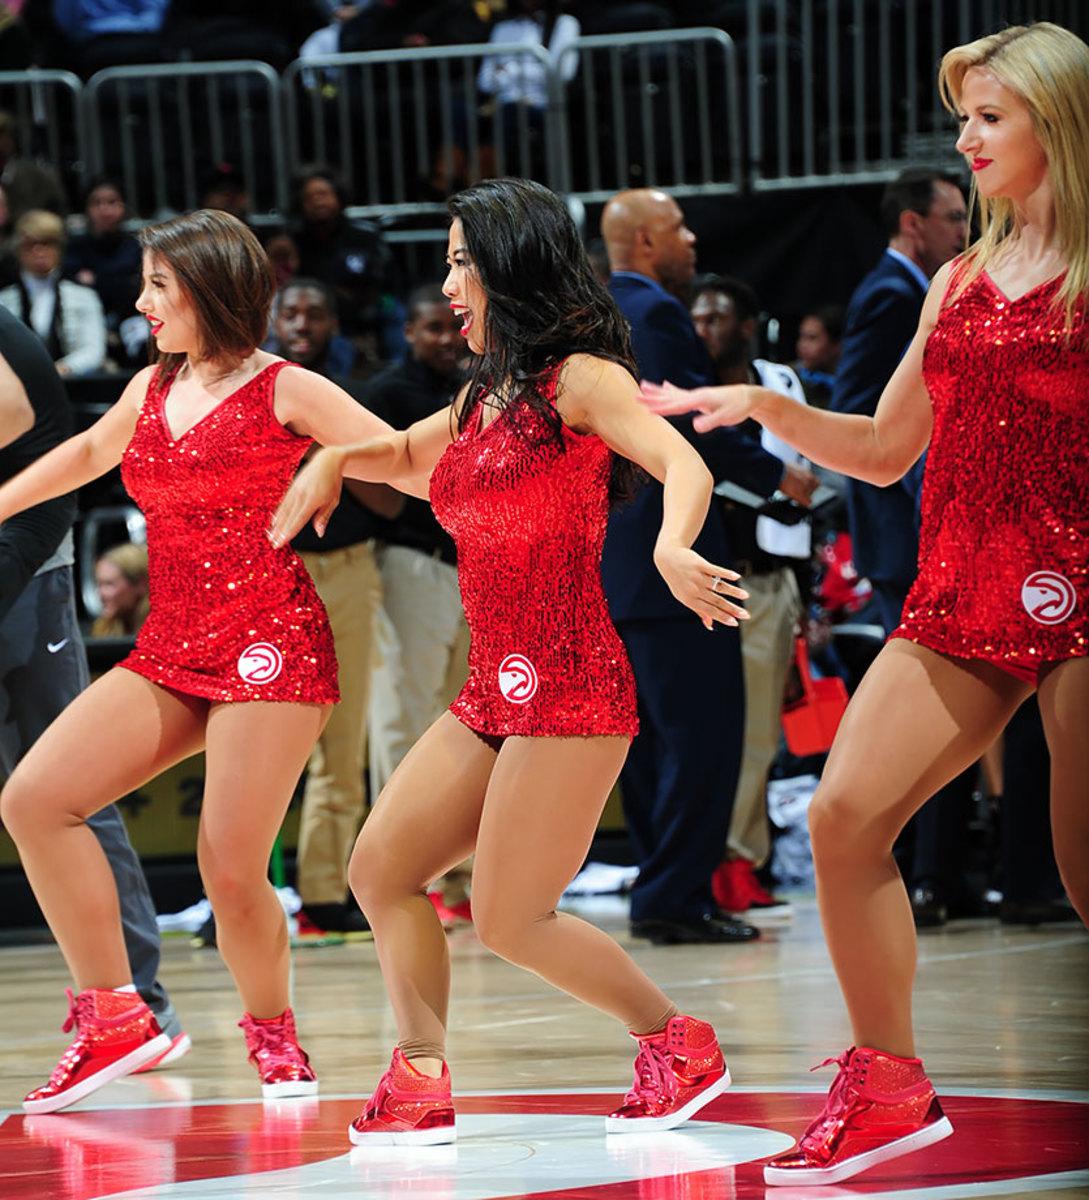 Atlanta-Hawks-Cheerleaders-509121732.jpg